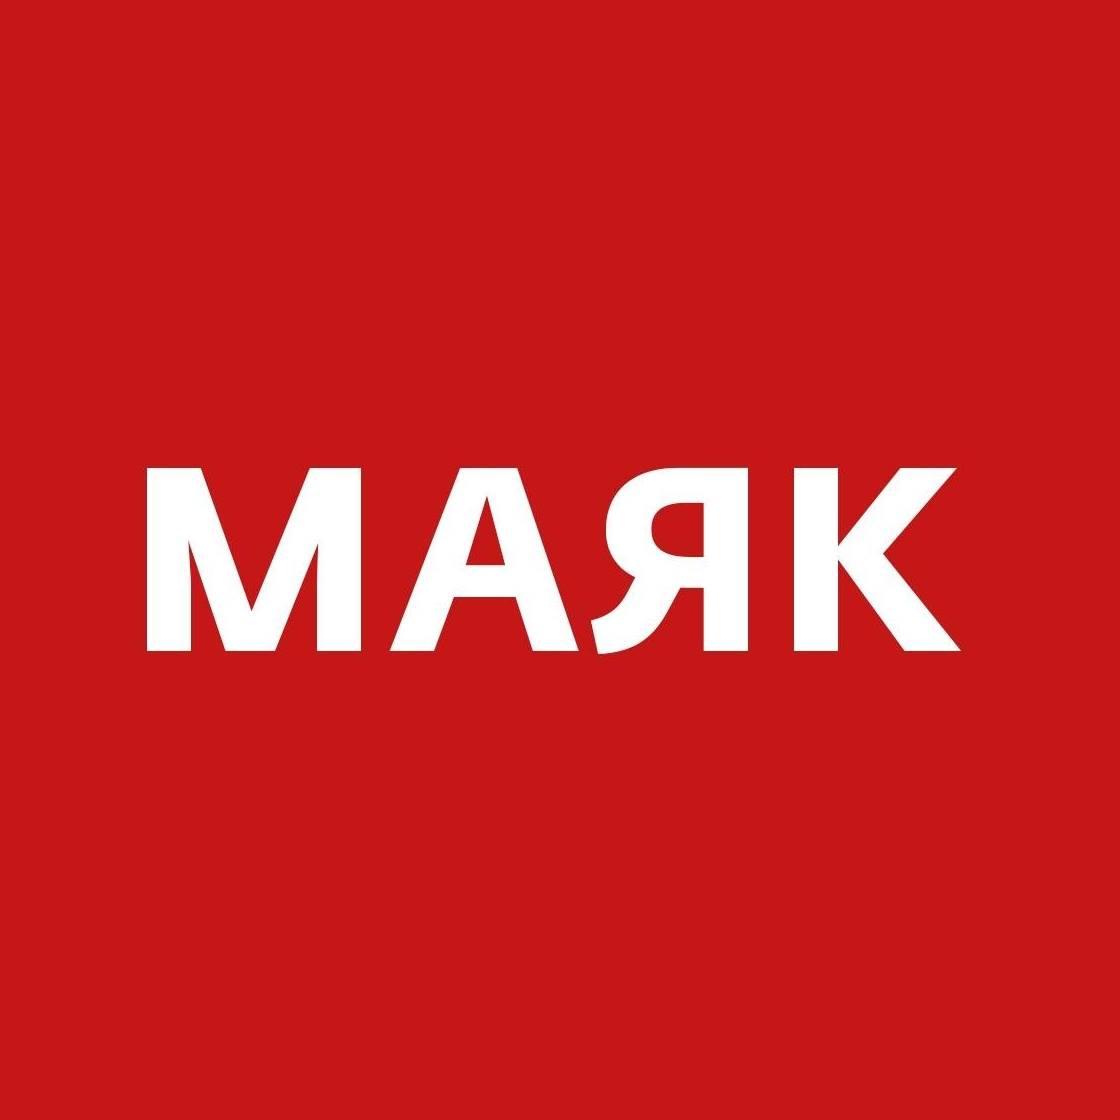 Радио Маяк 68.6 УКВ Россия, Ханты-Мансийск